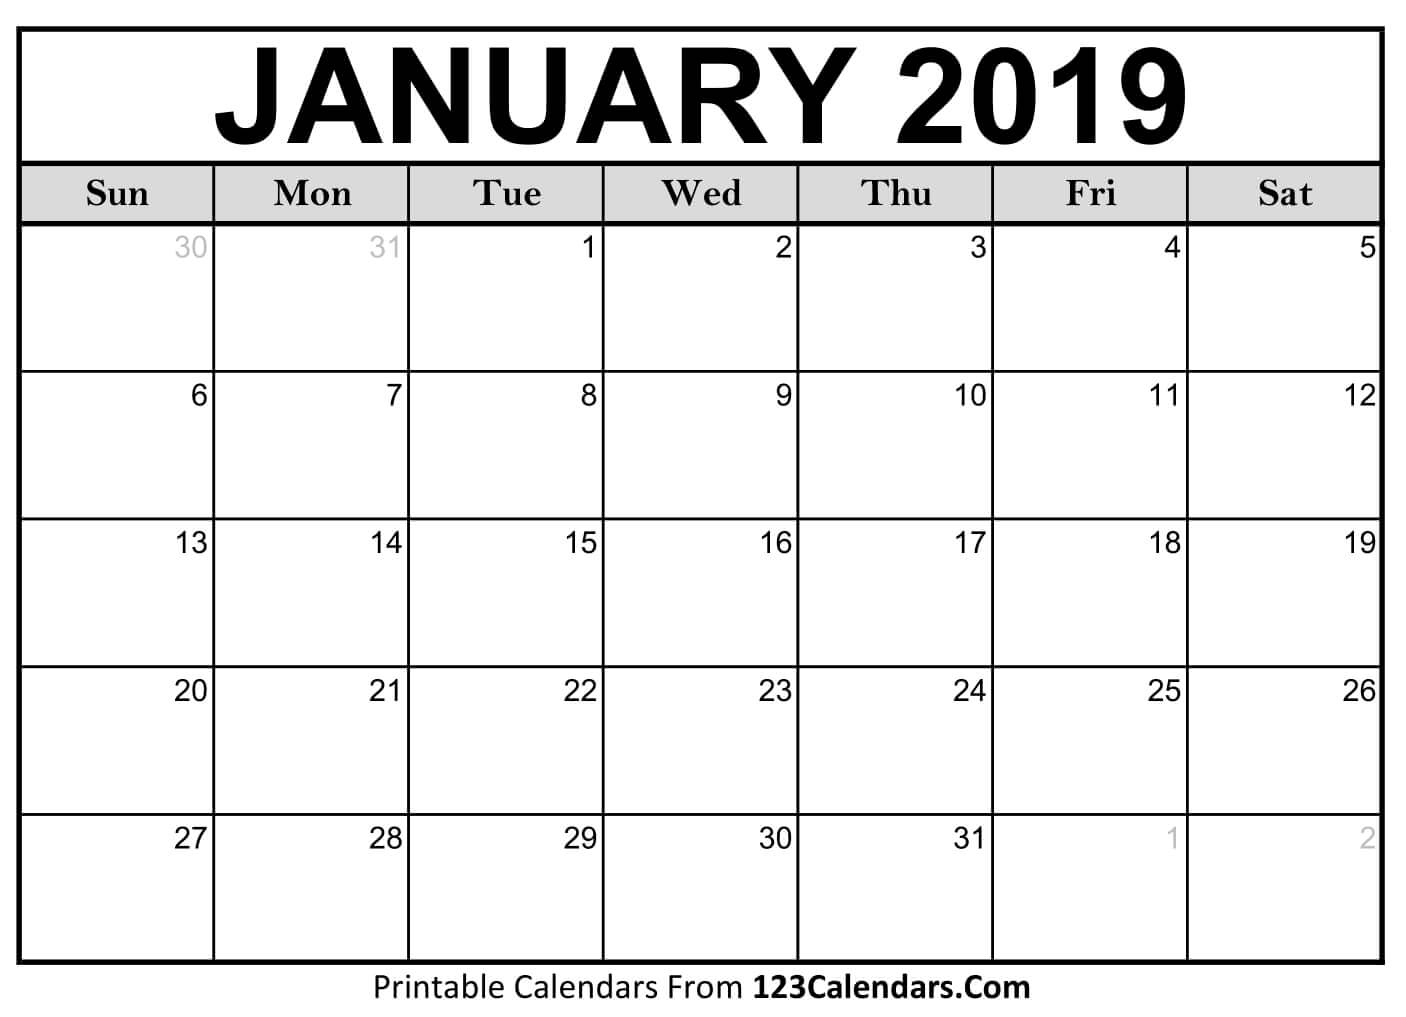 Printable Jan 2019 Calendar